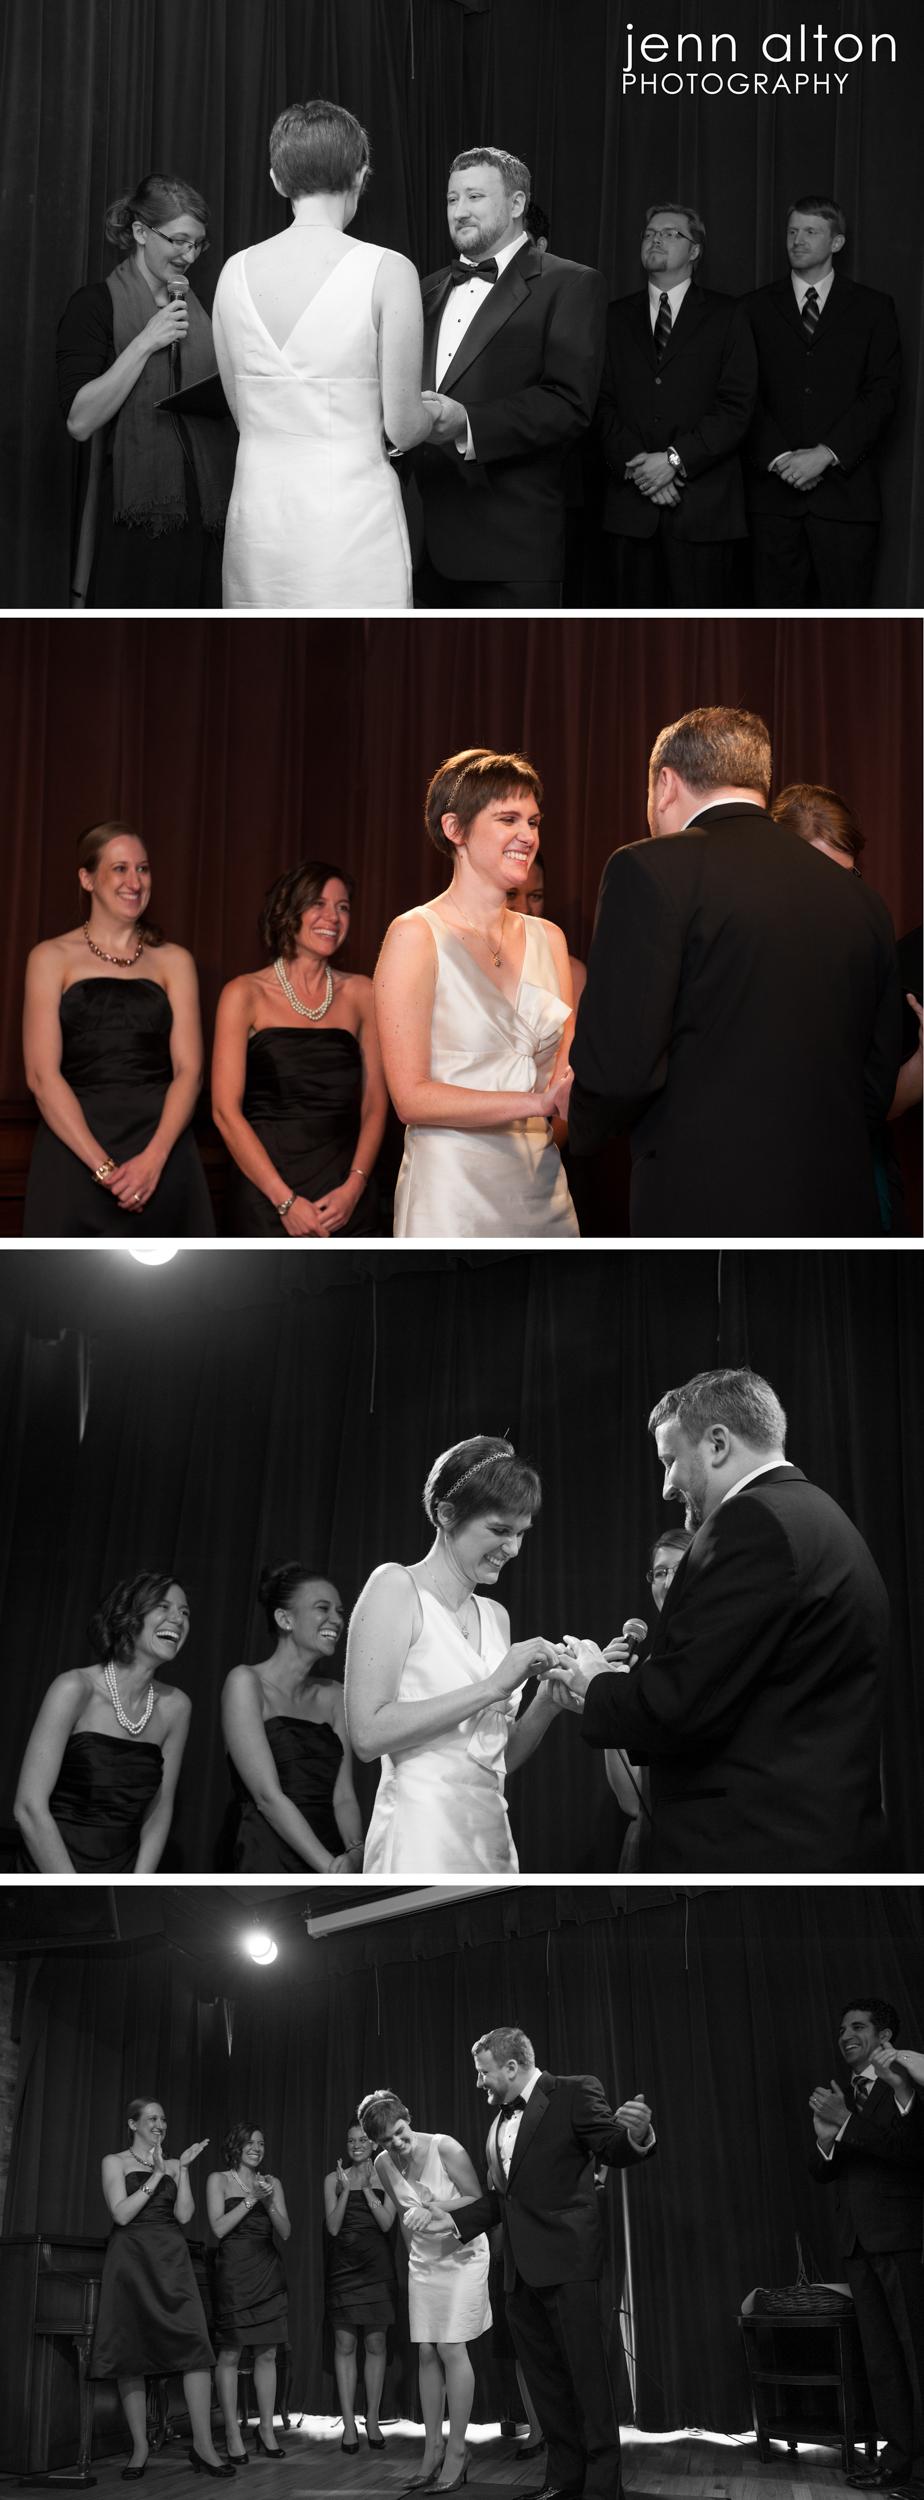 Ring exchange and vows, Uncommon Ground on Devon, Chicago, IL